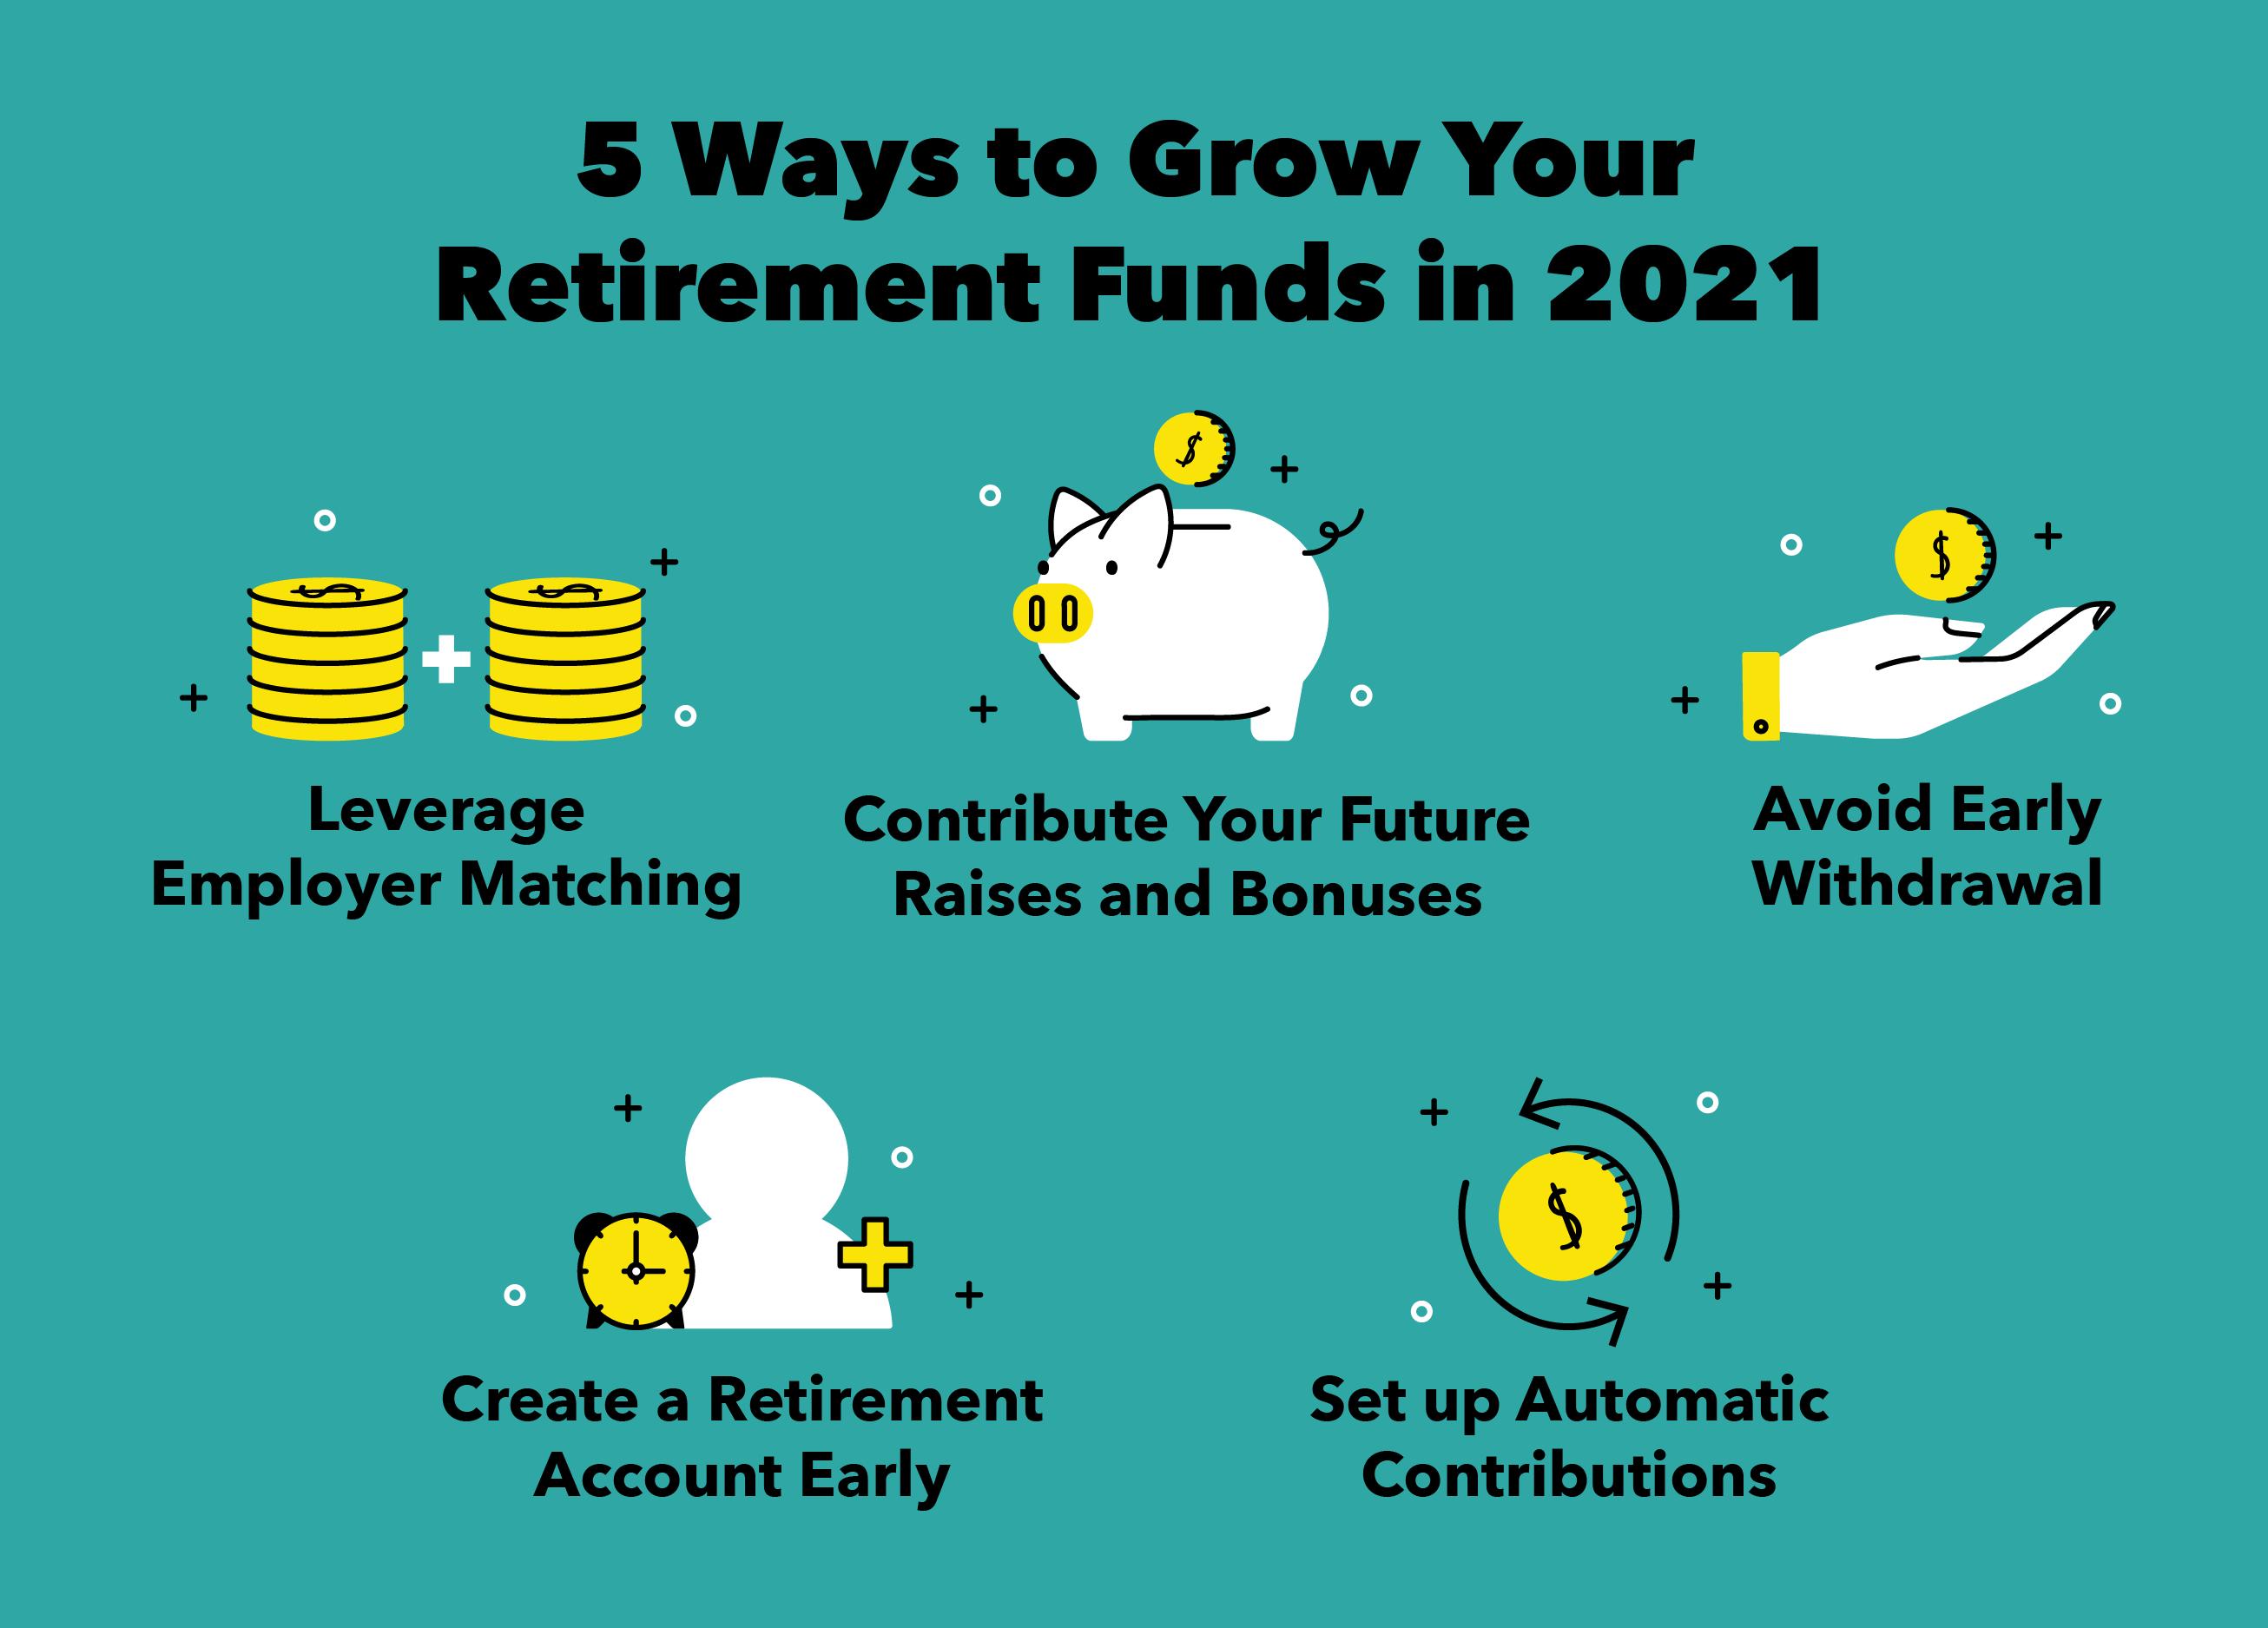 5 Ways to Grow Your Retirement Savings